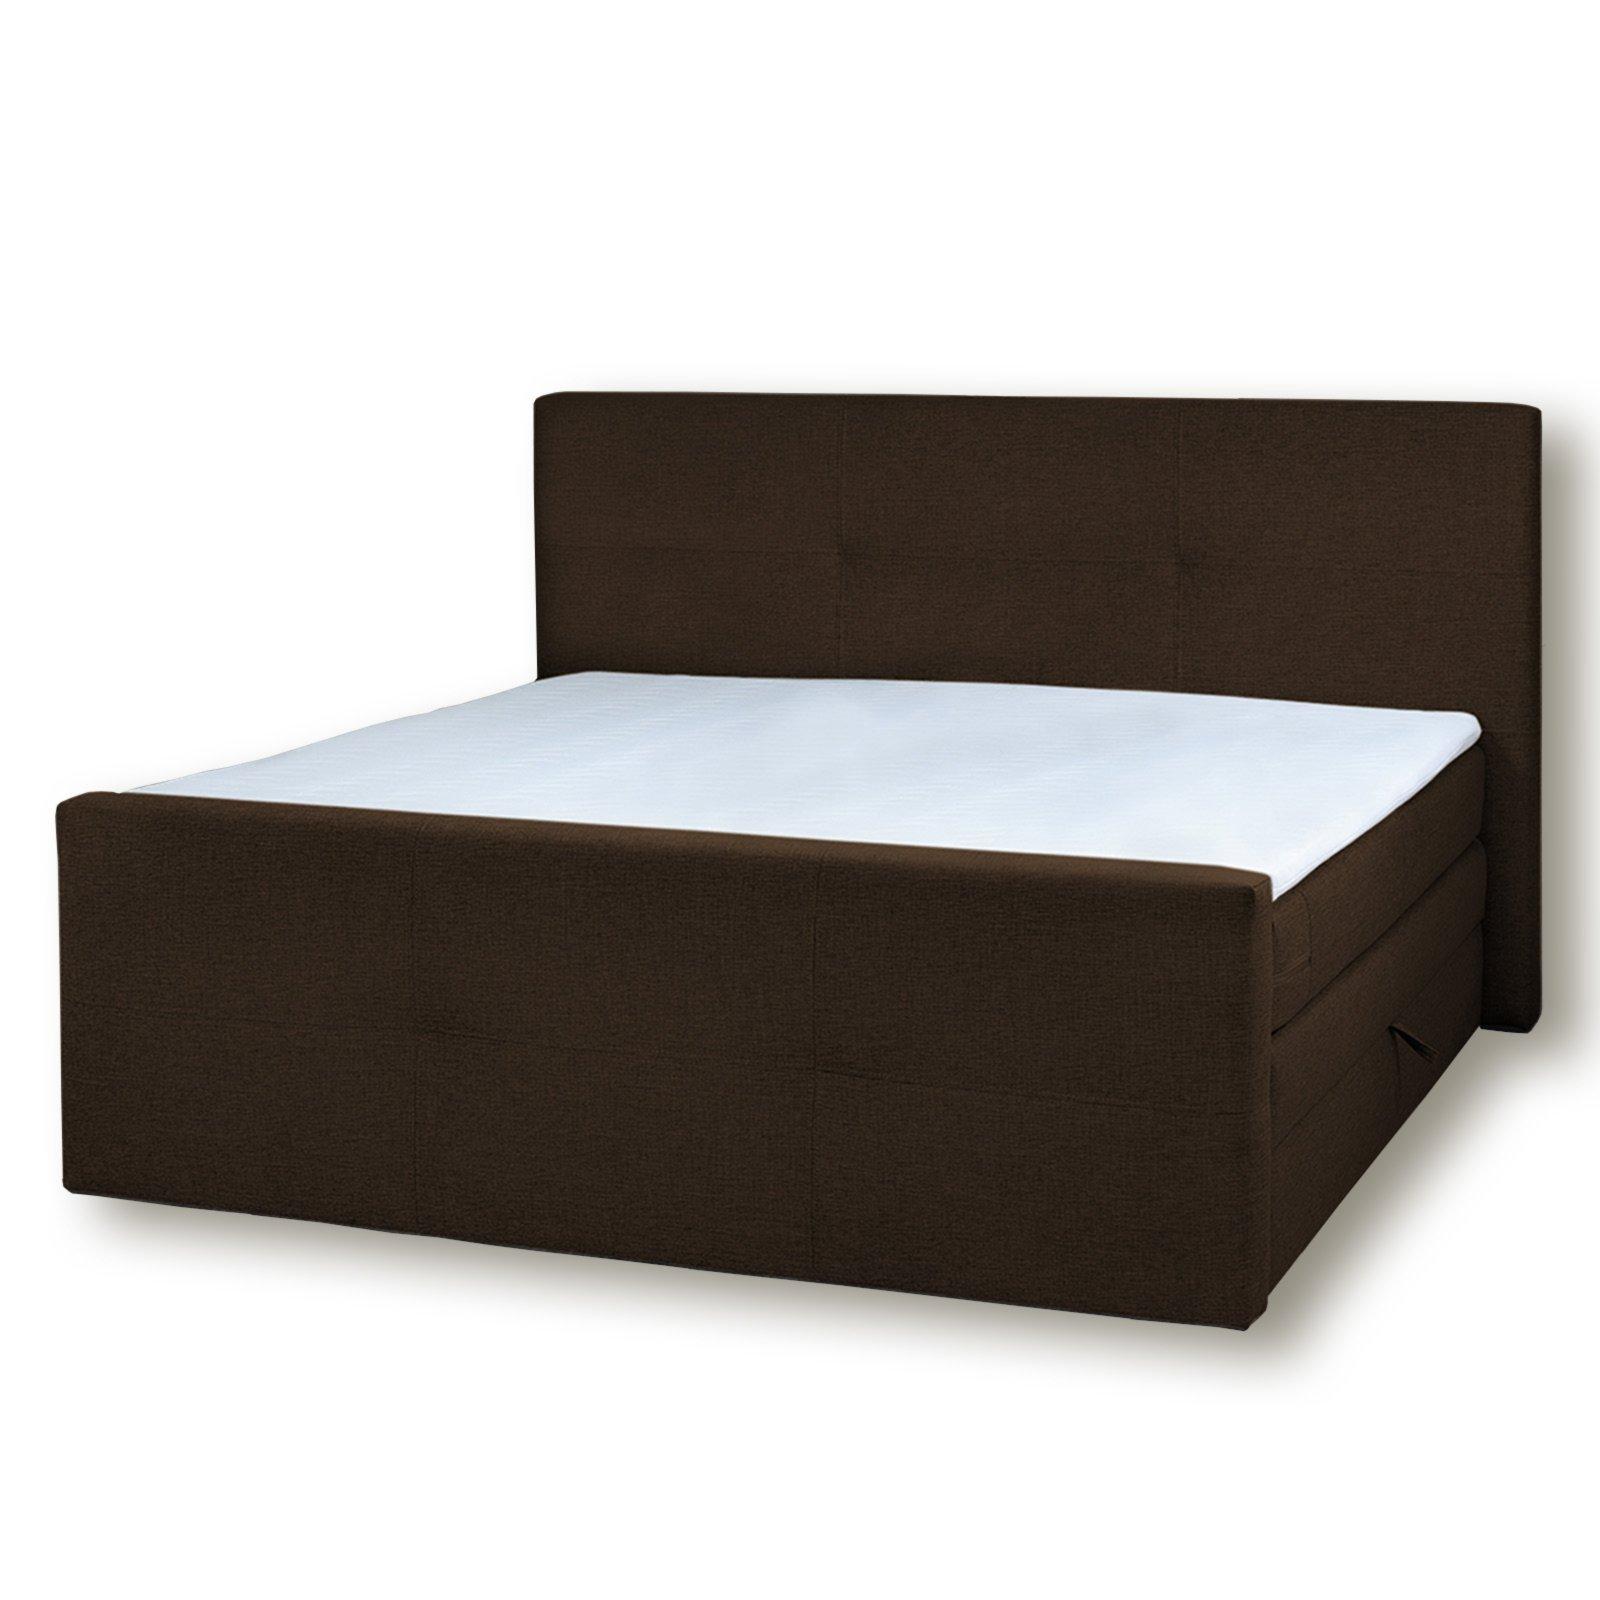 boxspringbett havana braun 160x200 cm boxspringbetten betten m bel roller m belhaus. Black Bedroom Furniture Sets. Home Design Ideas